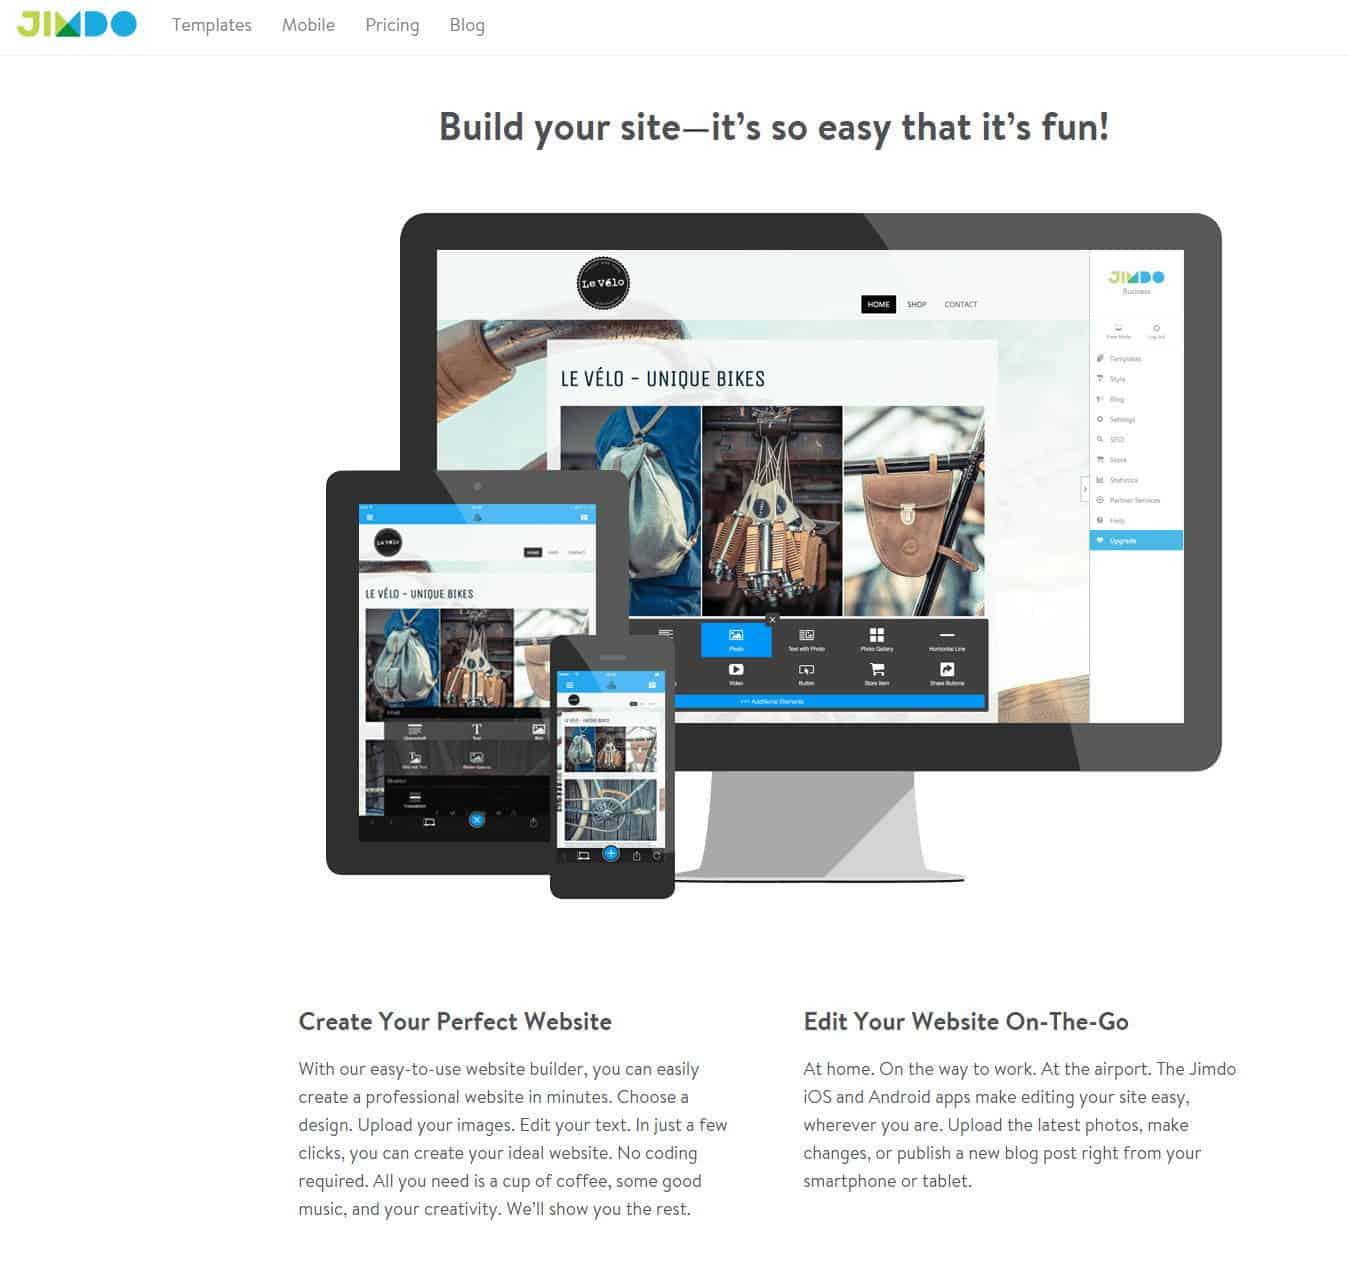 jimdo-homepage